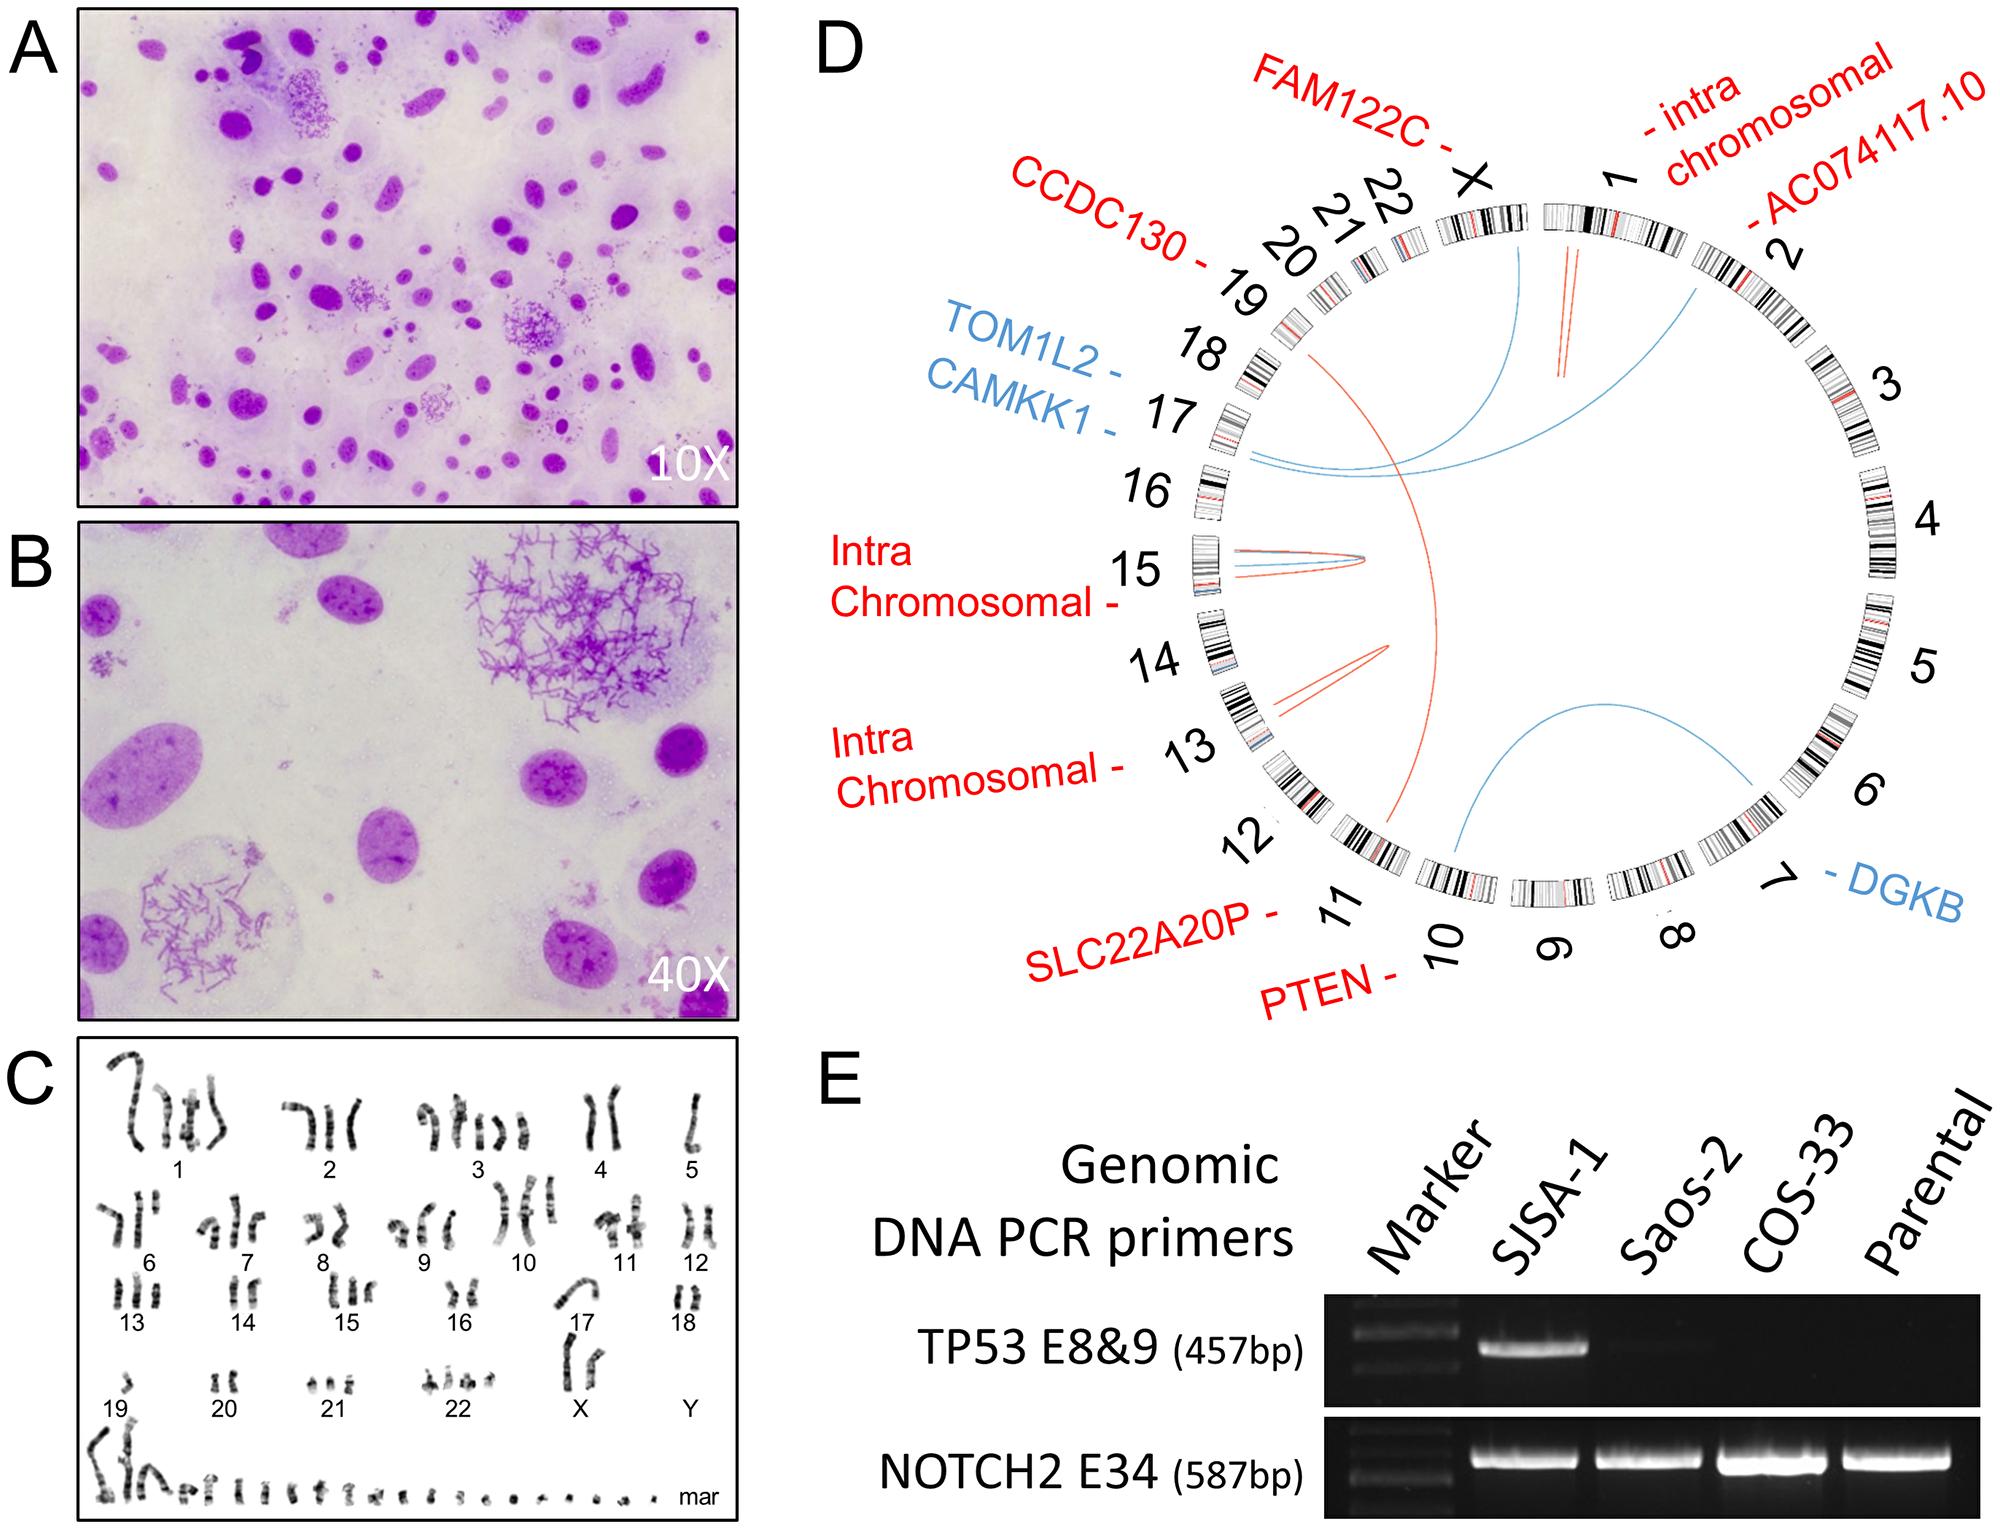 Conventional cytogenetics analysis and genomic analysis.